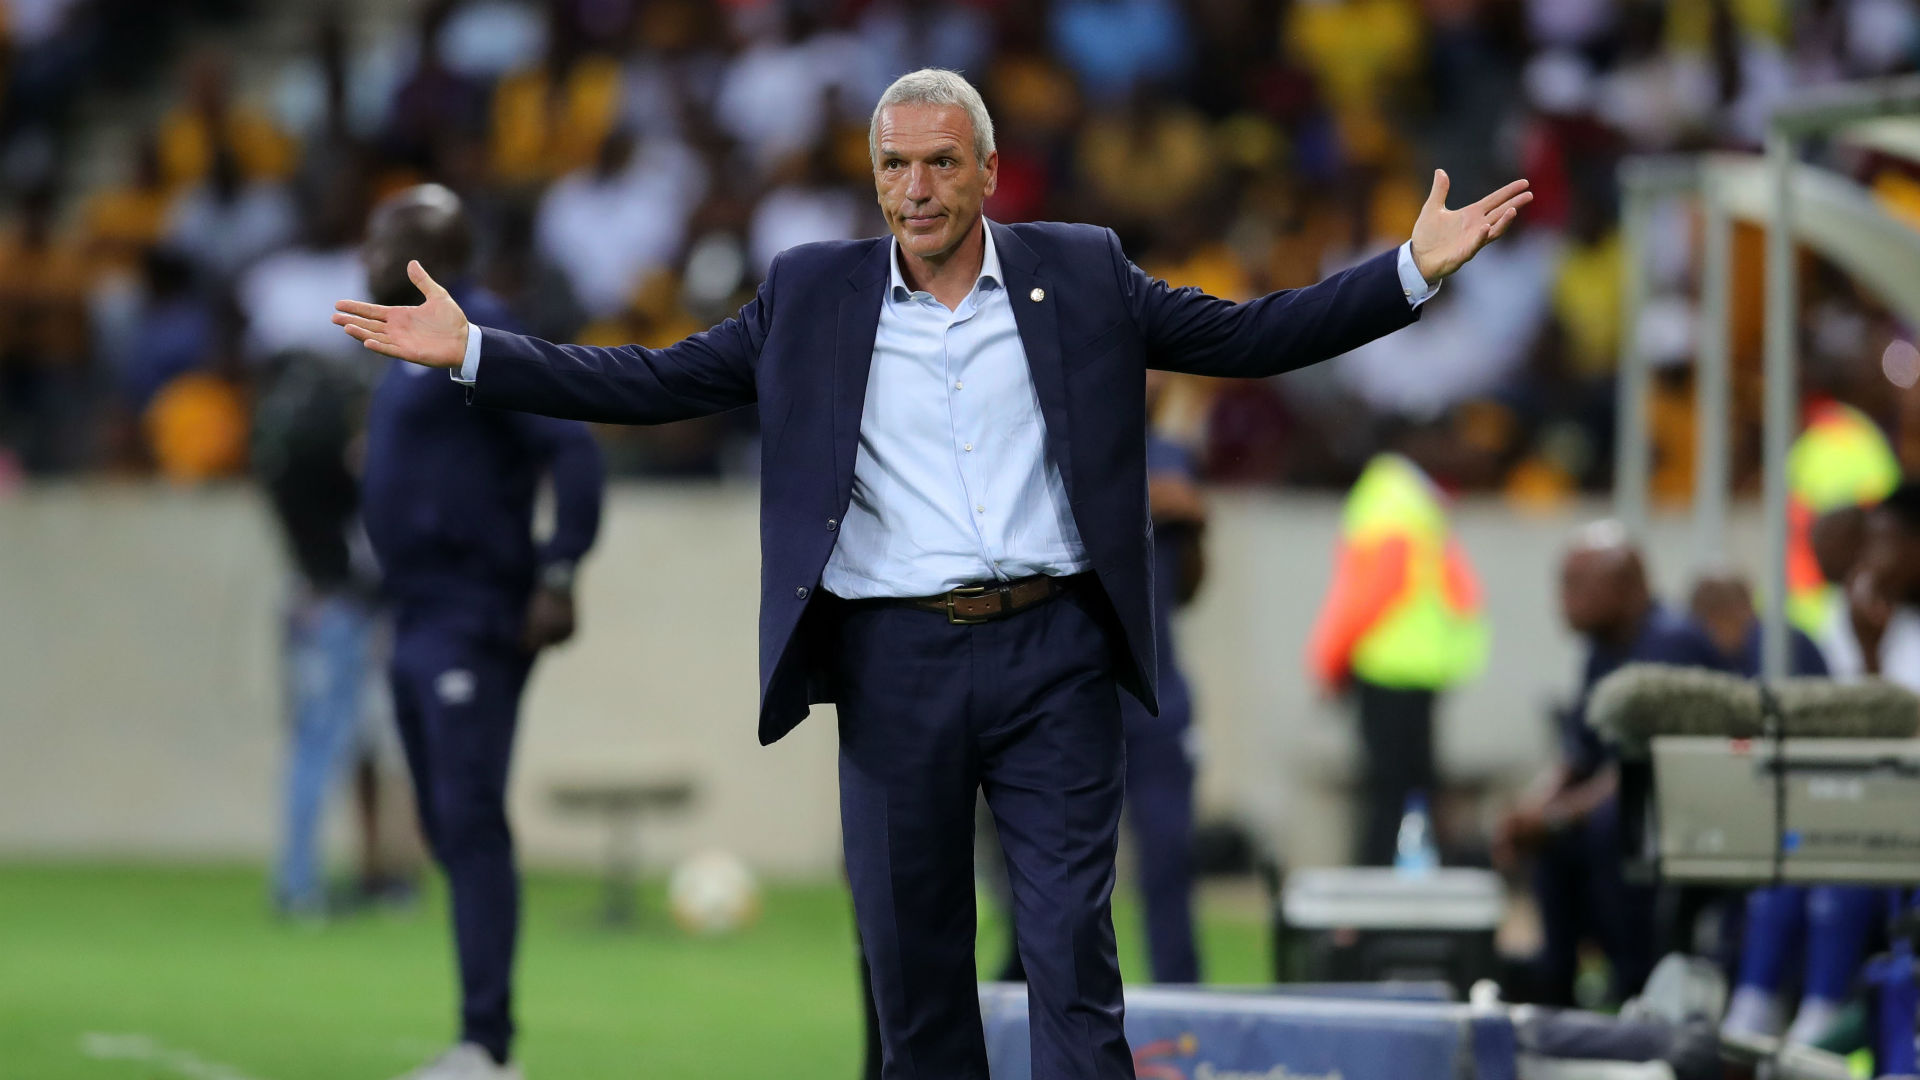 Kaizer Chiefs coach Middendorp throws jabs at Mamelodi Sundowns' Mosimane